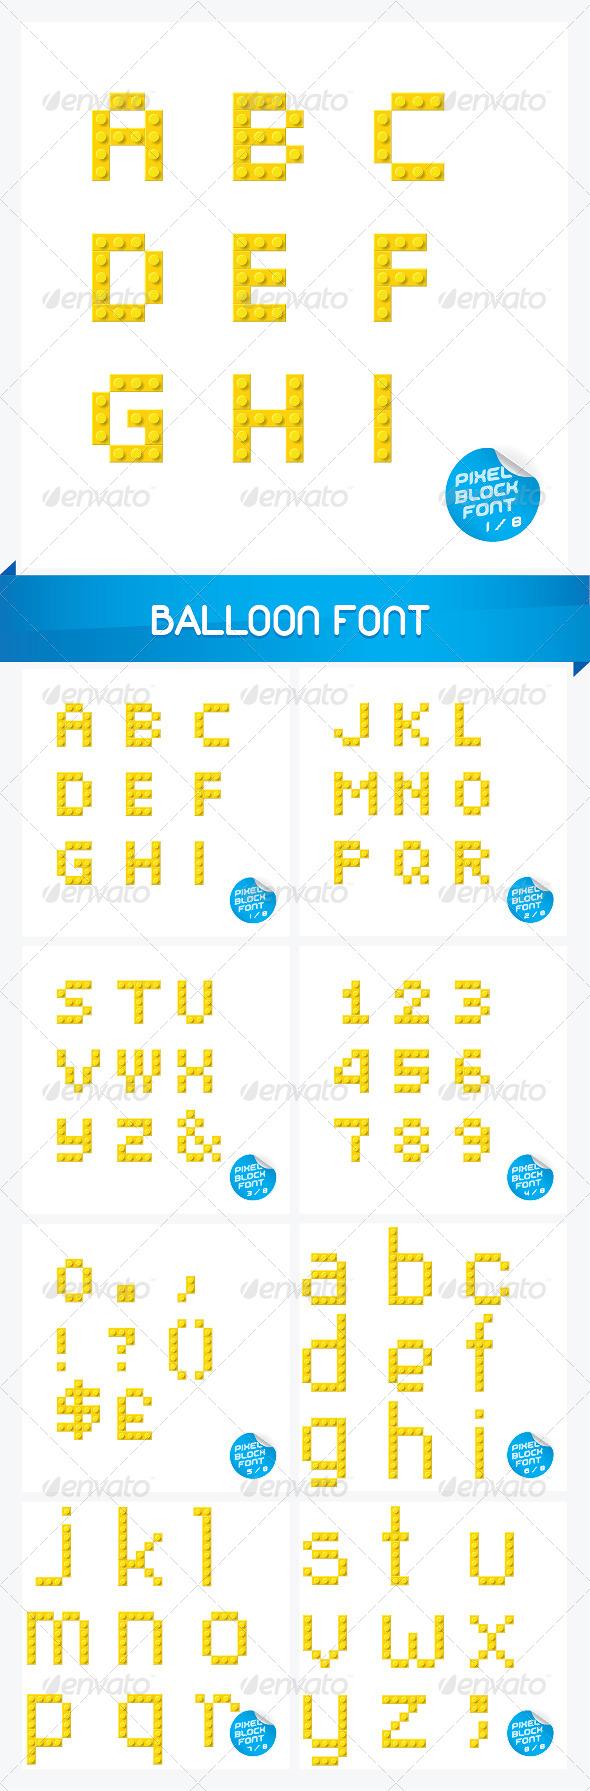 GraphicRiver Pixel Block Font 6178414